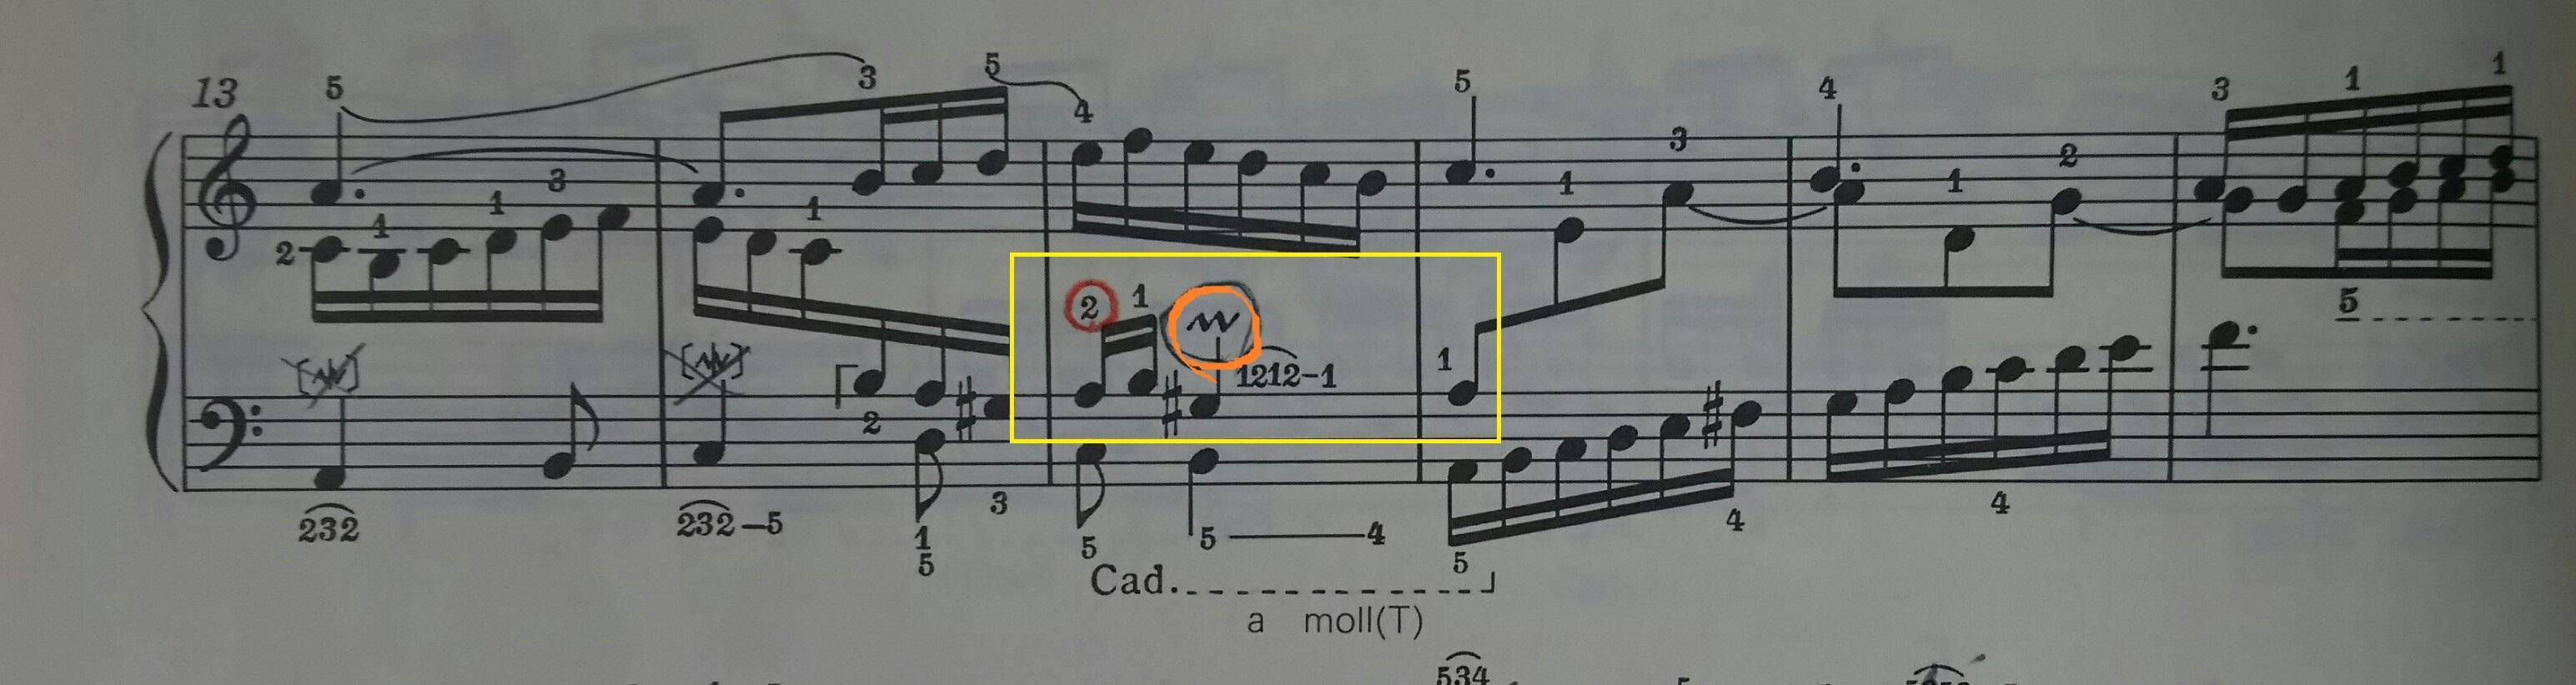 IMG_20180629_134930_BWV799_13-18.jpg